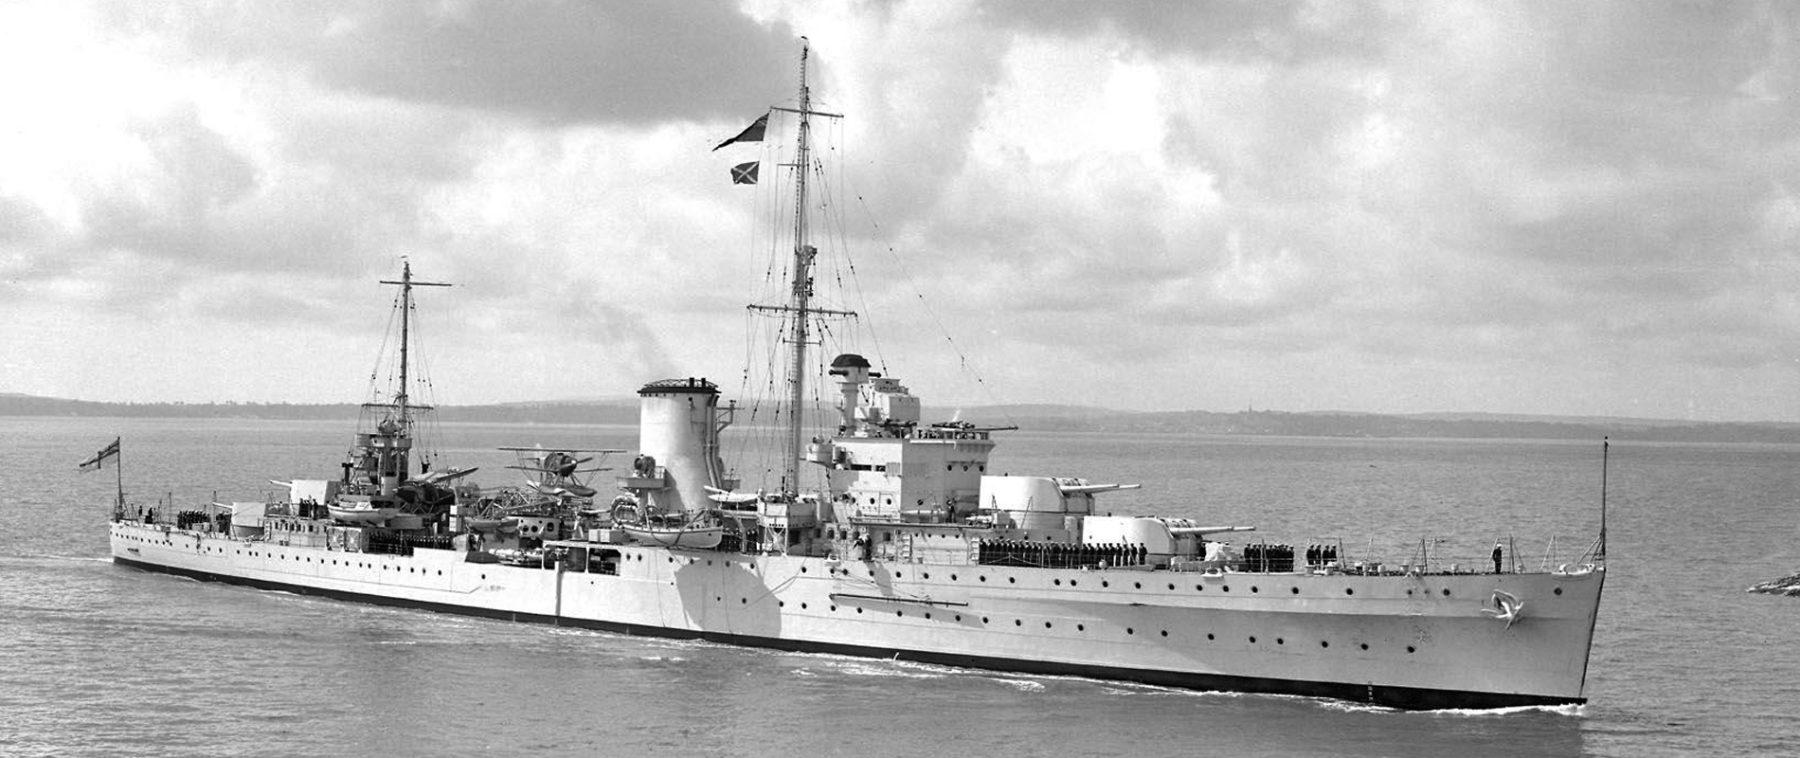 HMS Ajax prewar